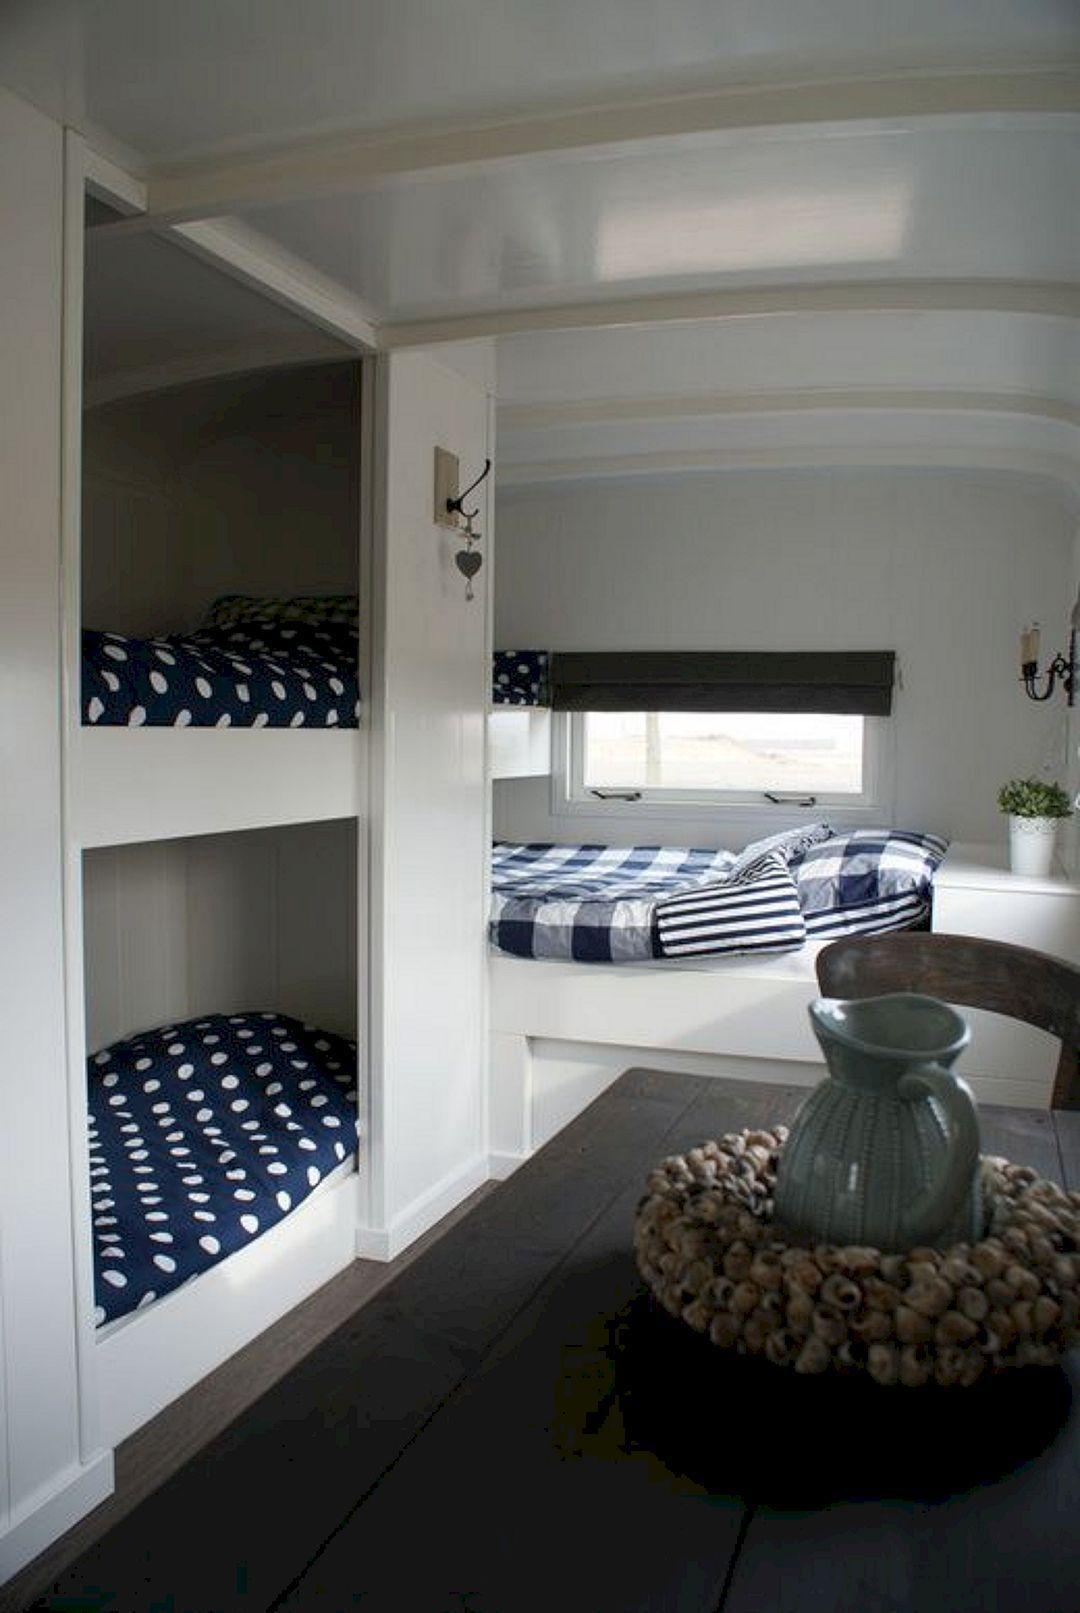 Small camper interior marvelous top  rv campers interior remodel hacks ideas